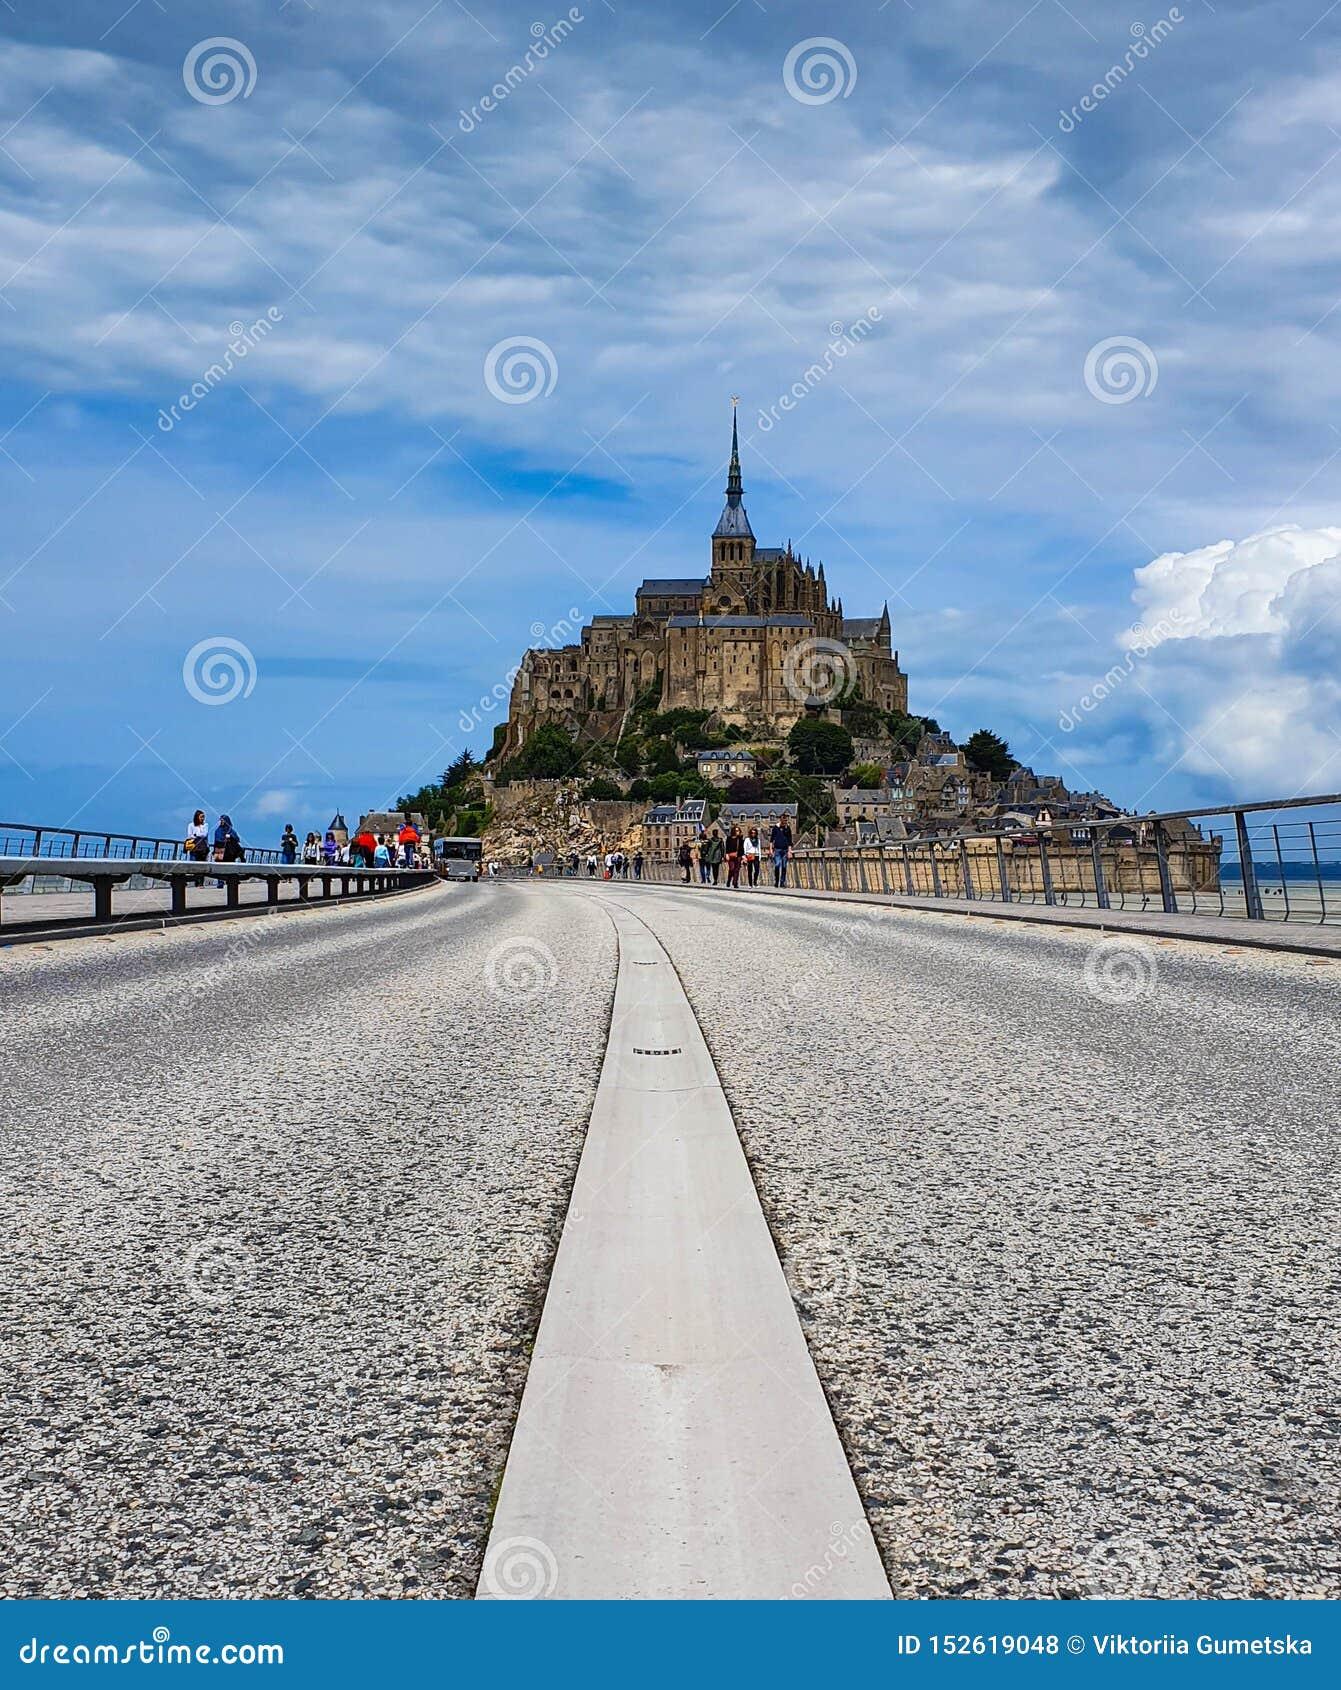 Mont Saint-Michel, Normandy, northern France. Summer 2019.